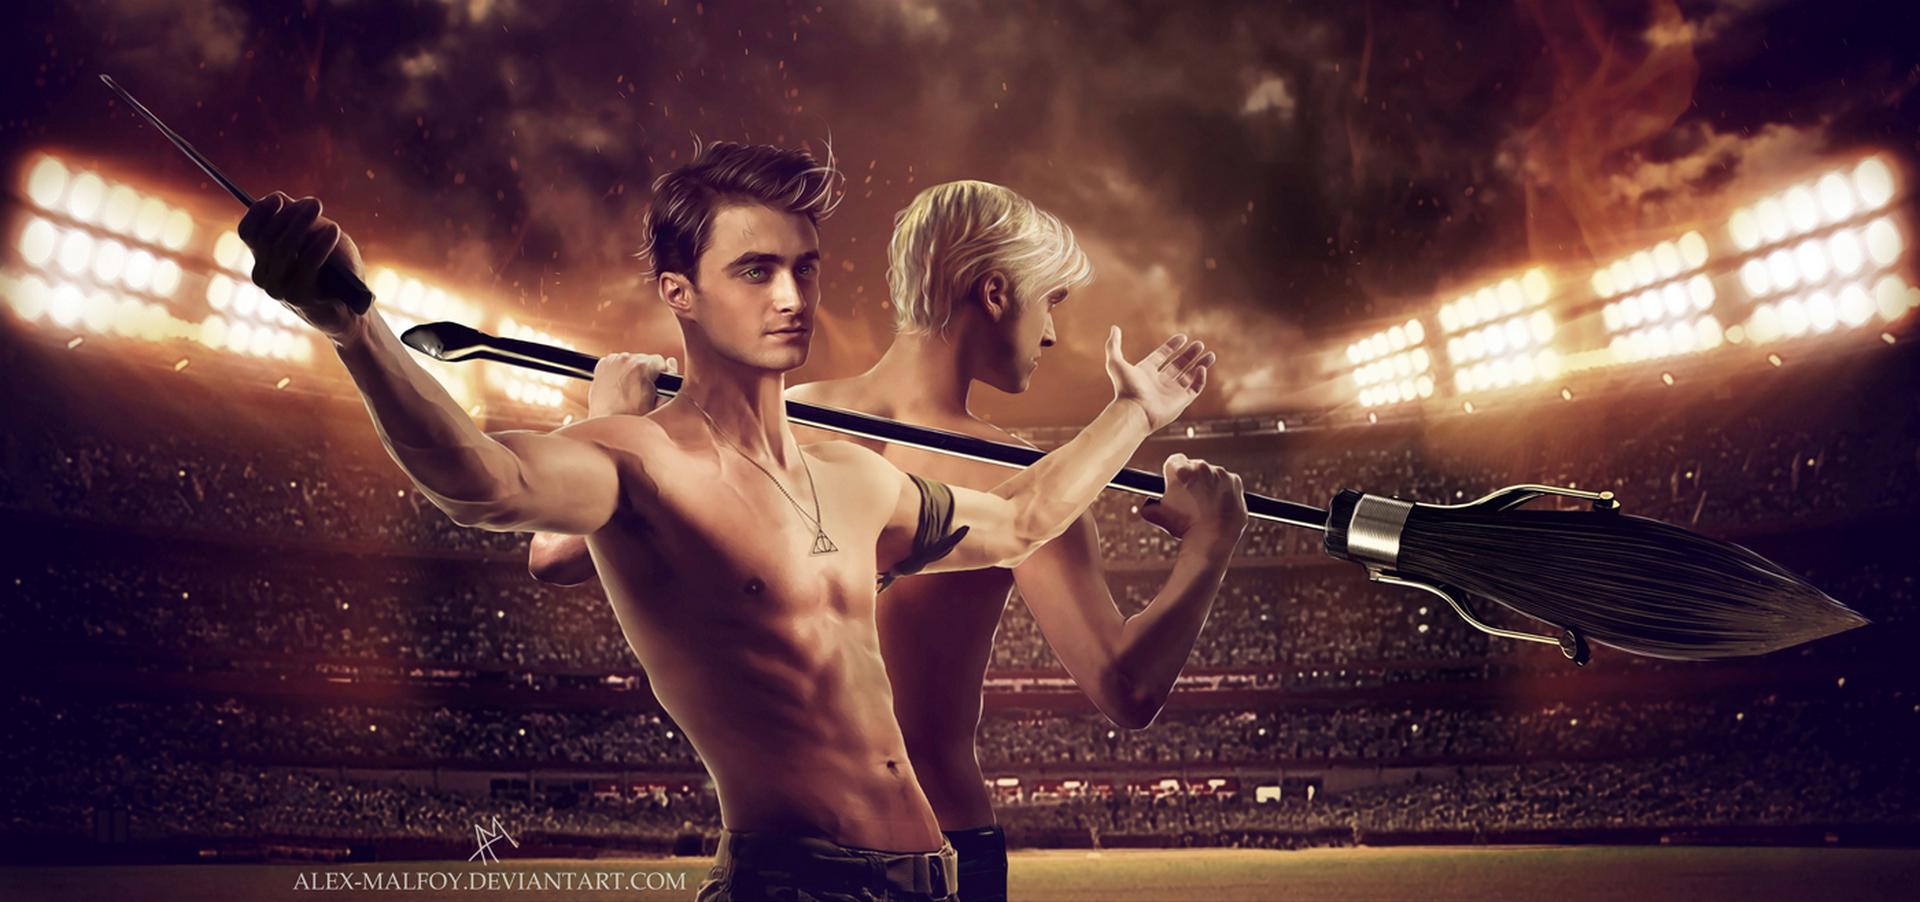 Fondos De Pantalla Alex Malfoy Harry Potter Draco Malfoy